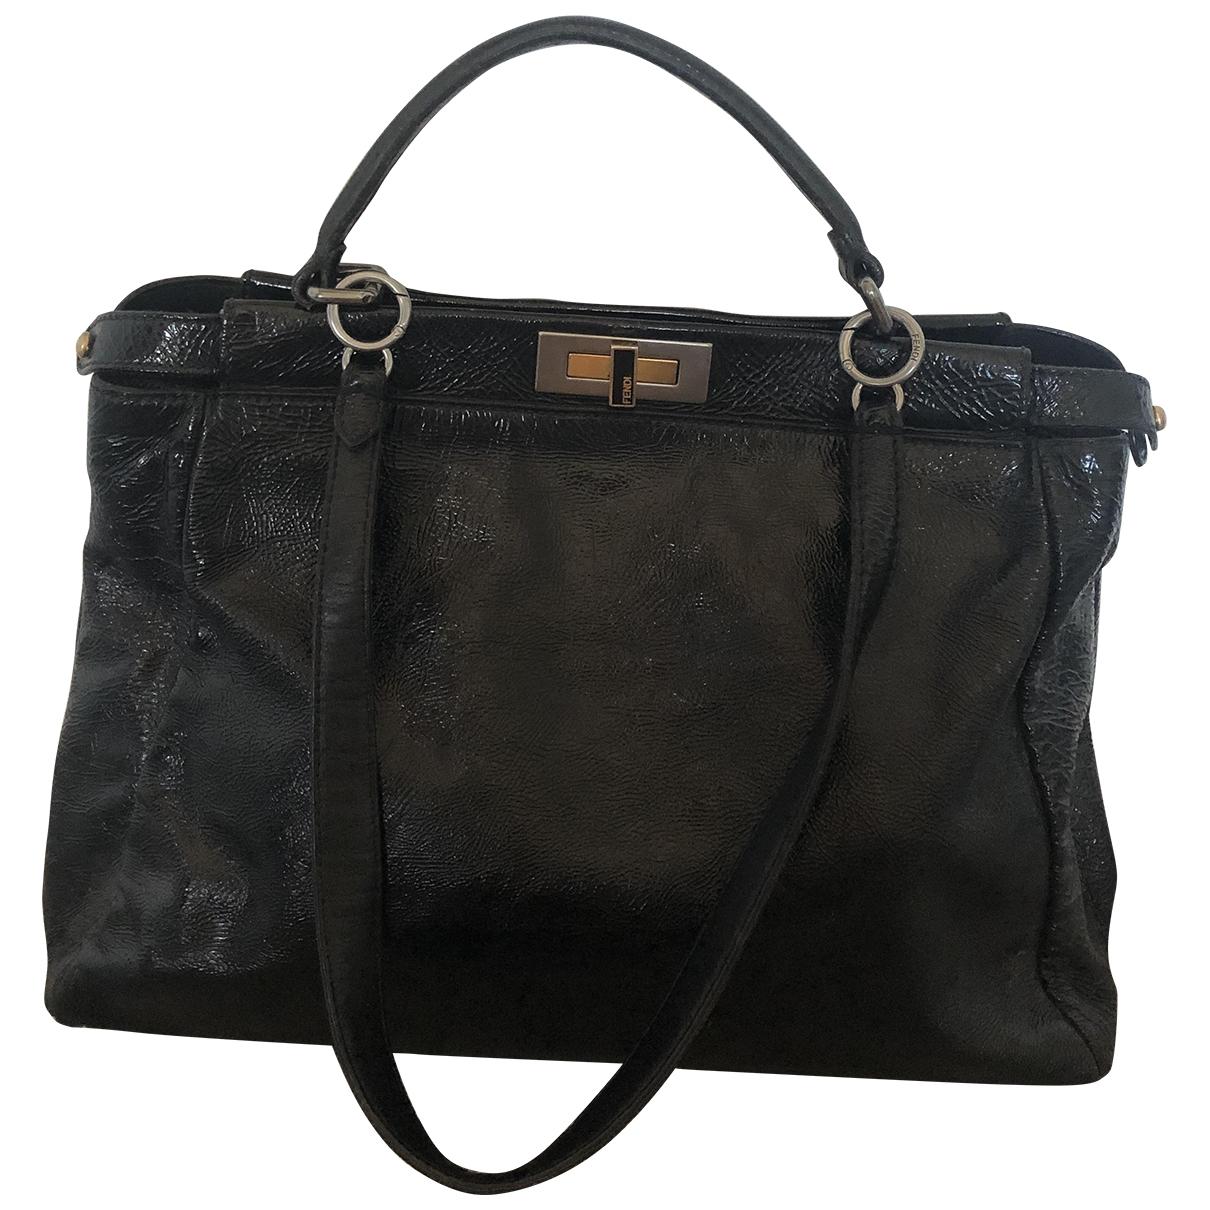 Fendi Peekaboo Black Patent leather handbag for Women \N